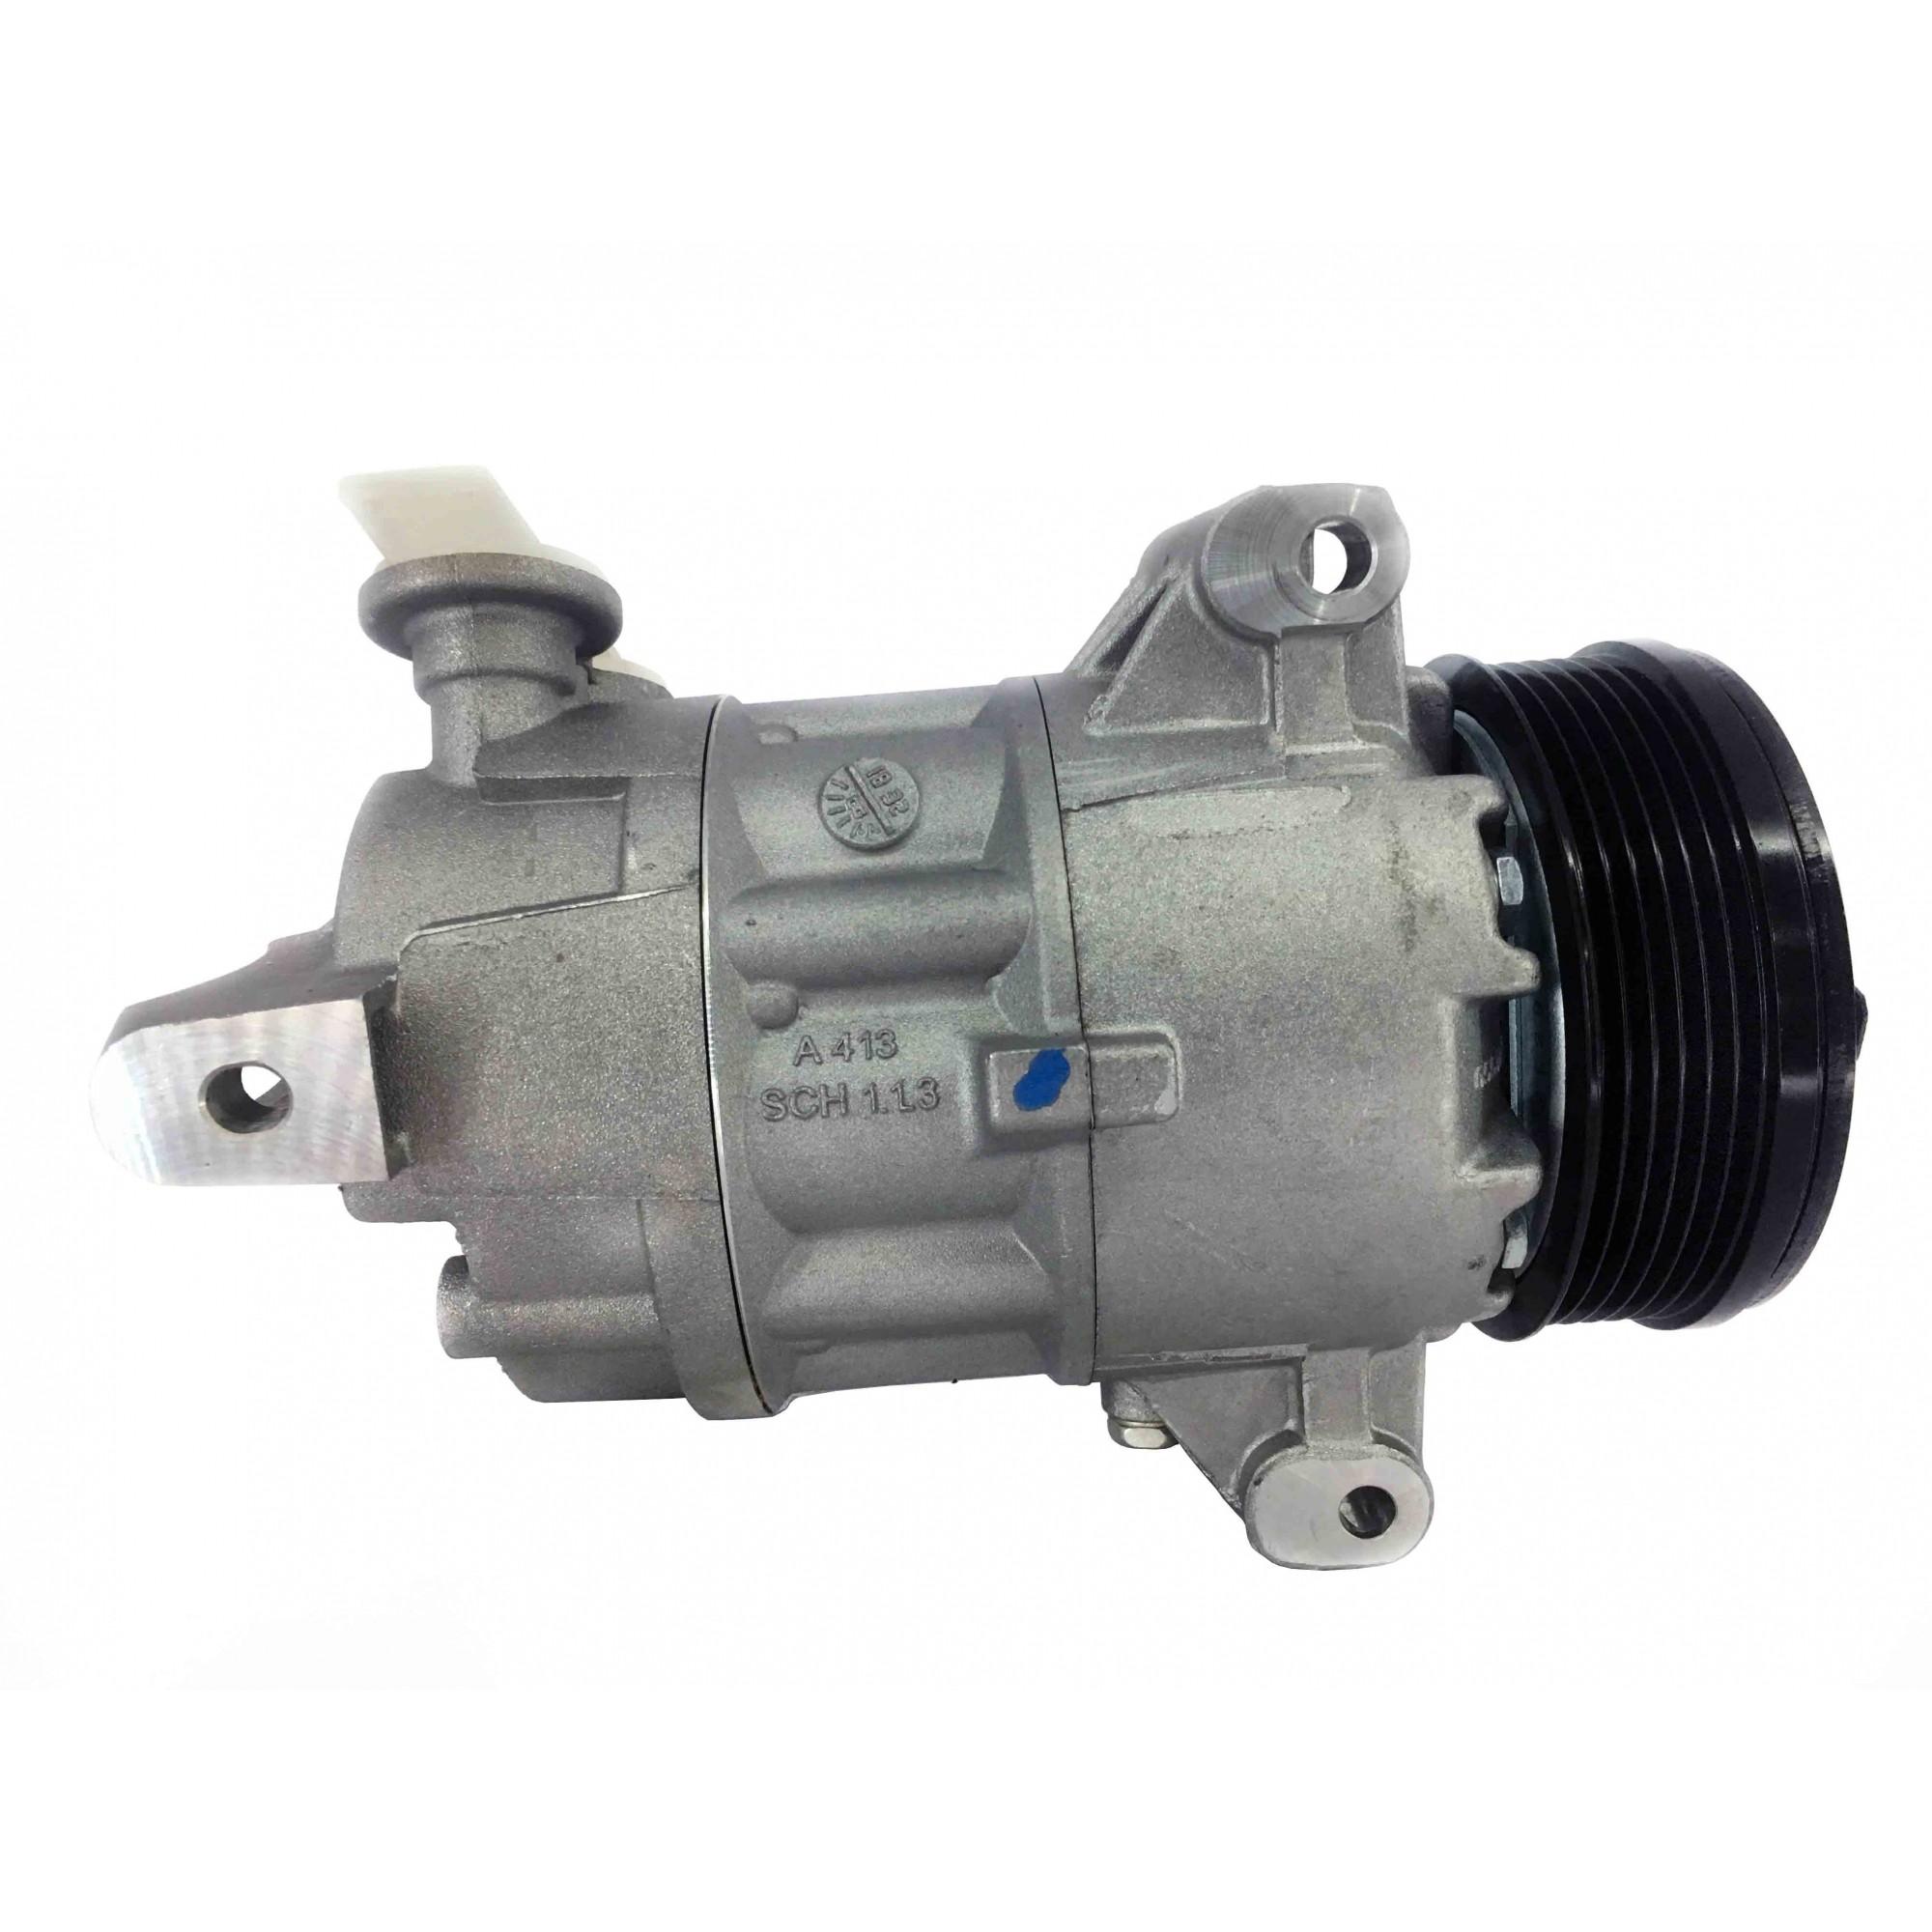 Compressor De Ar S10 2.4 Gas 2.8 Diesel Mahle